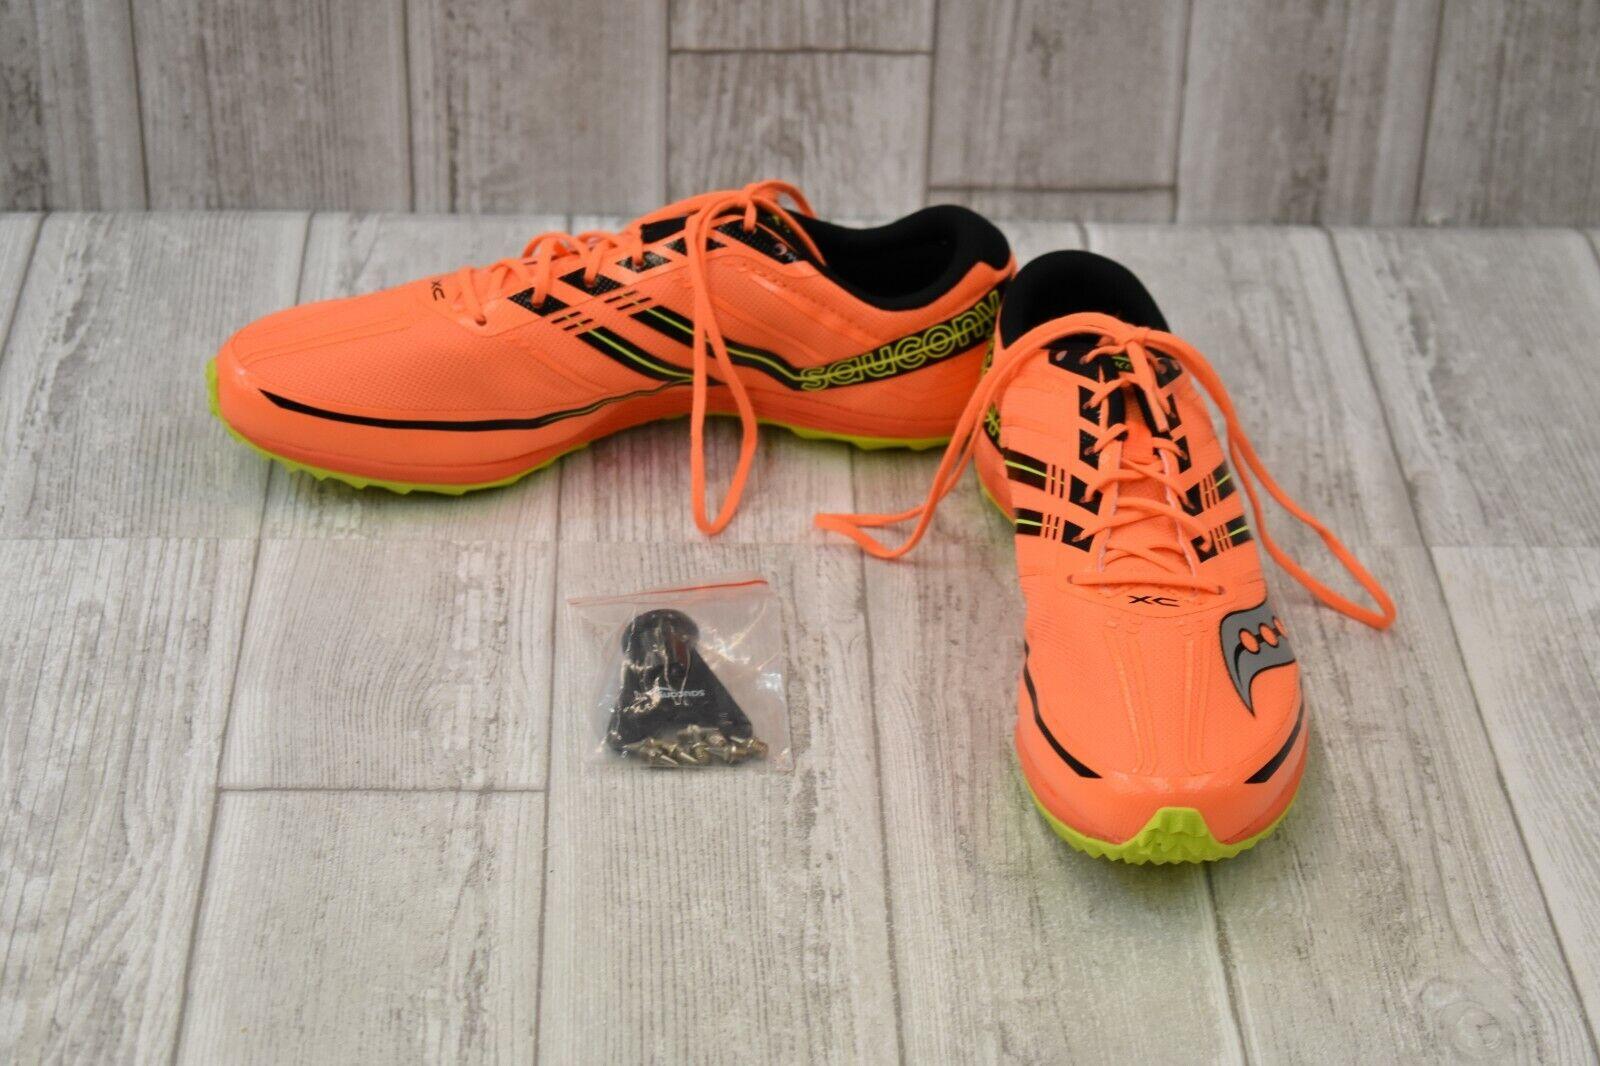 Saucony Kilkenny XC7 Spike Racing shoes - Men's Size 11, orange